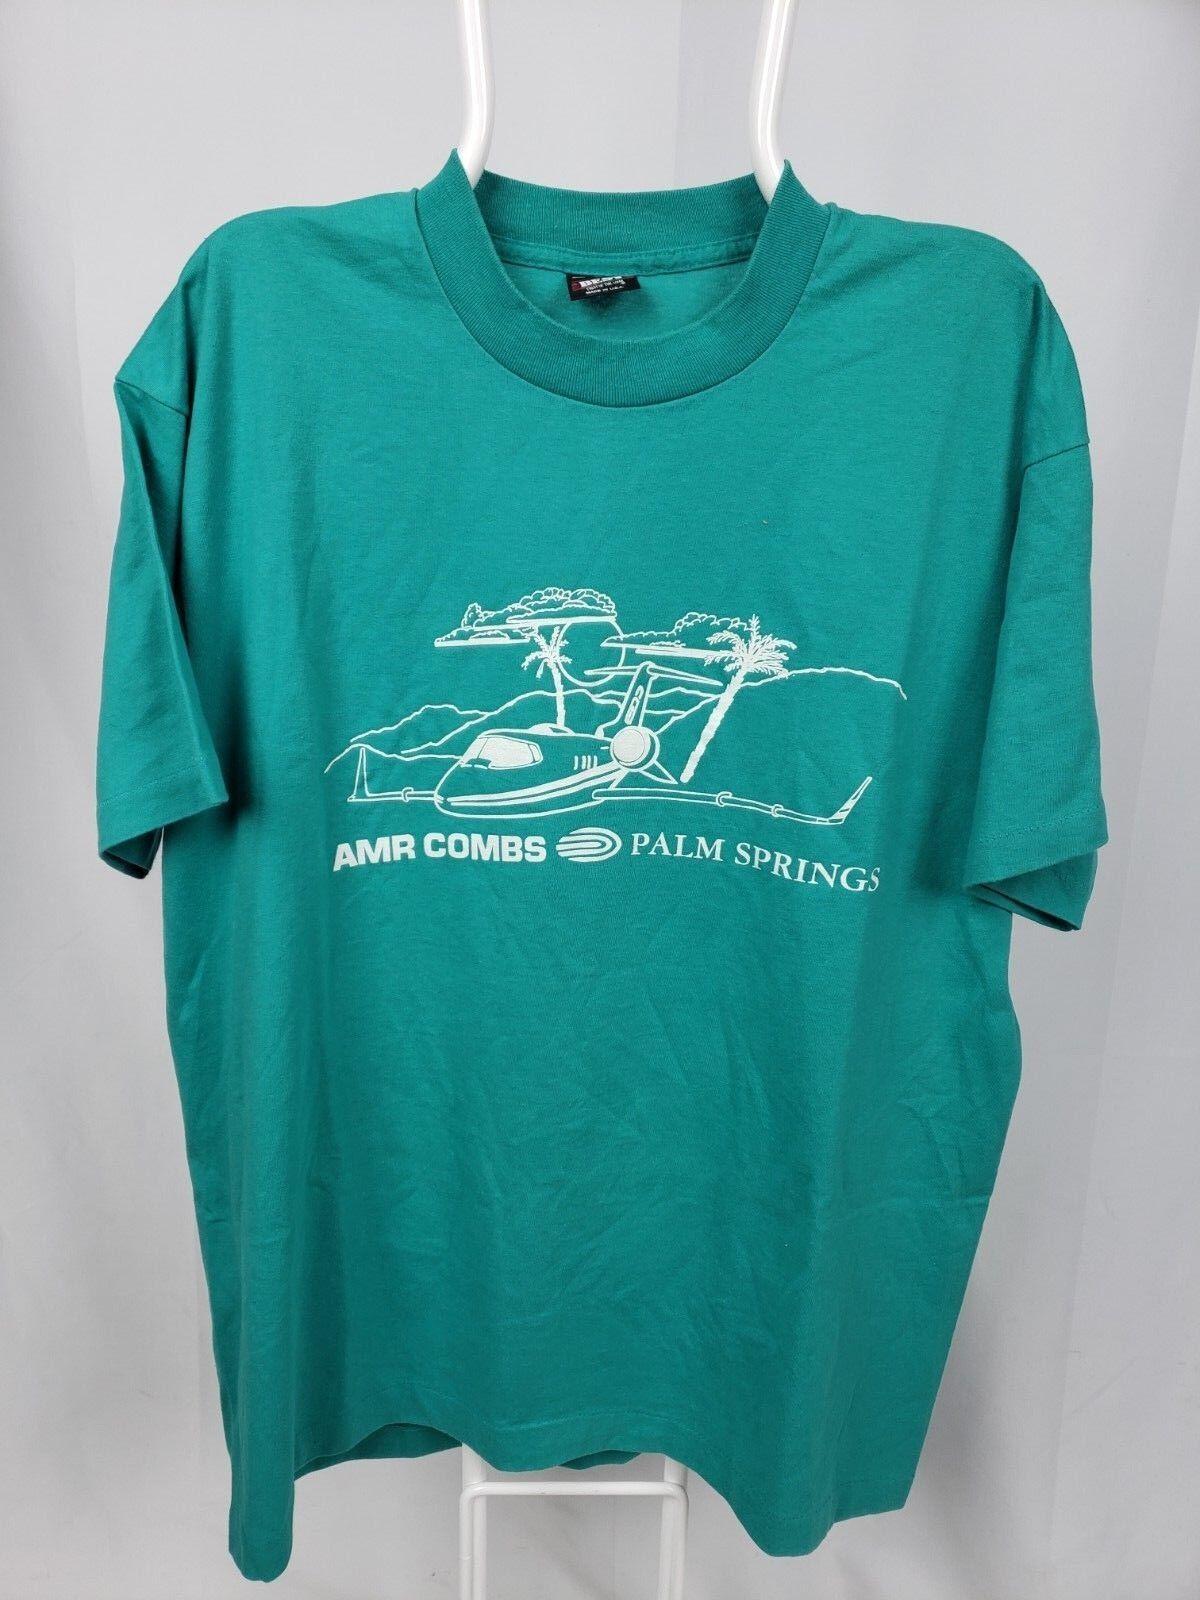 BEST FOTL 50/50 XL Blau T Shirt Vtg 80s AMR Combs Palm Springs Learjet Airport